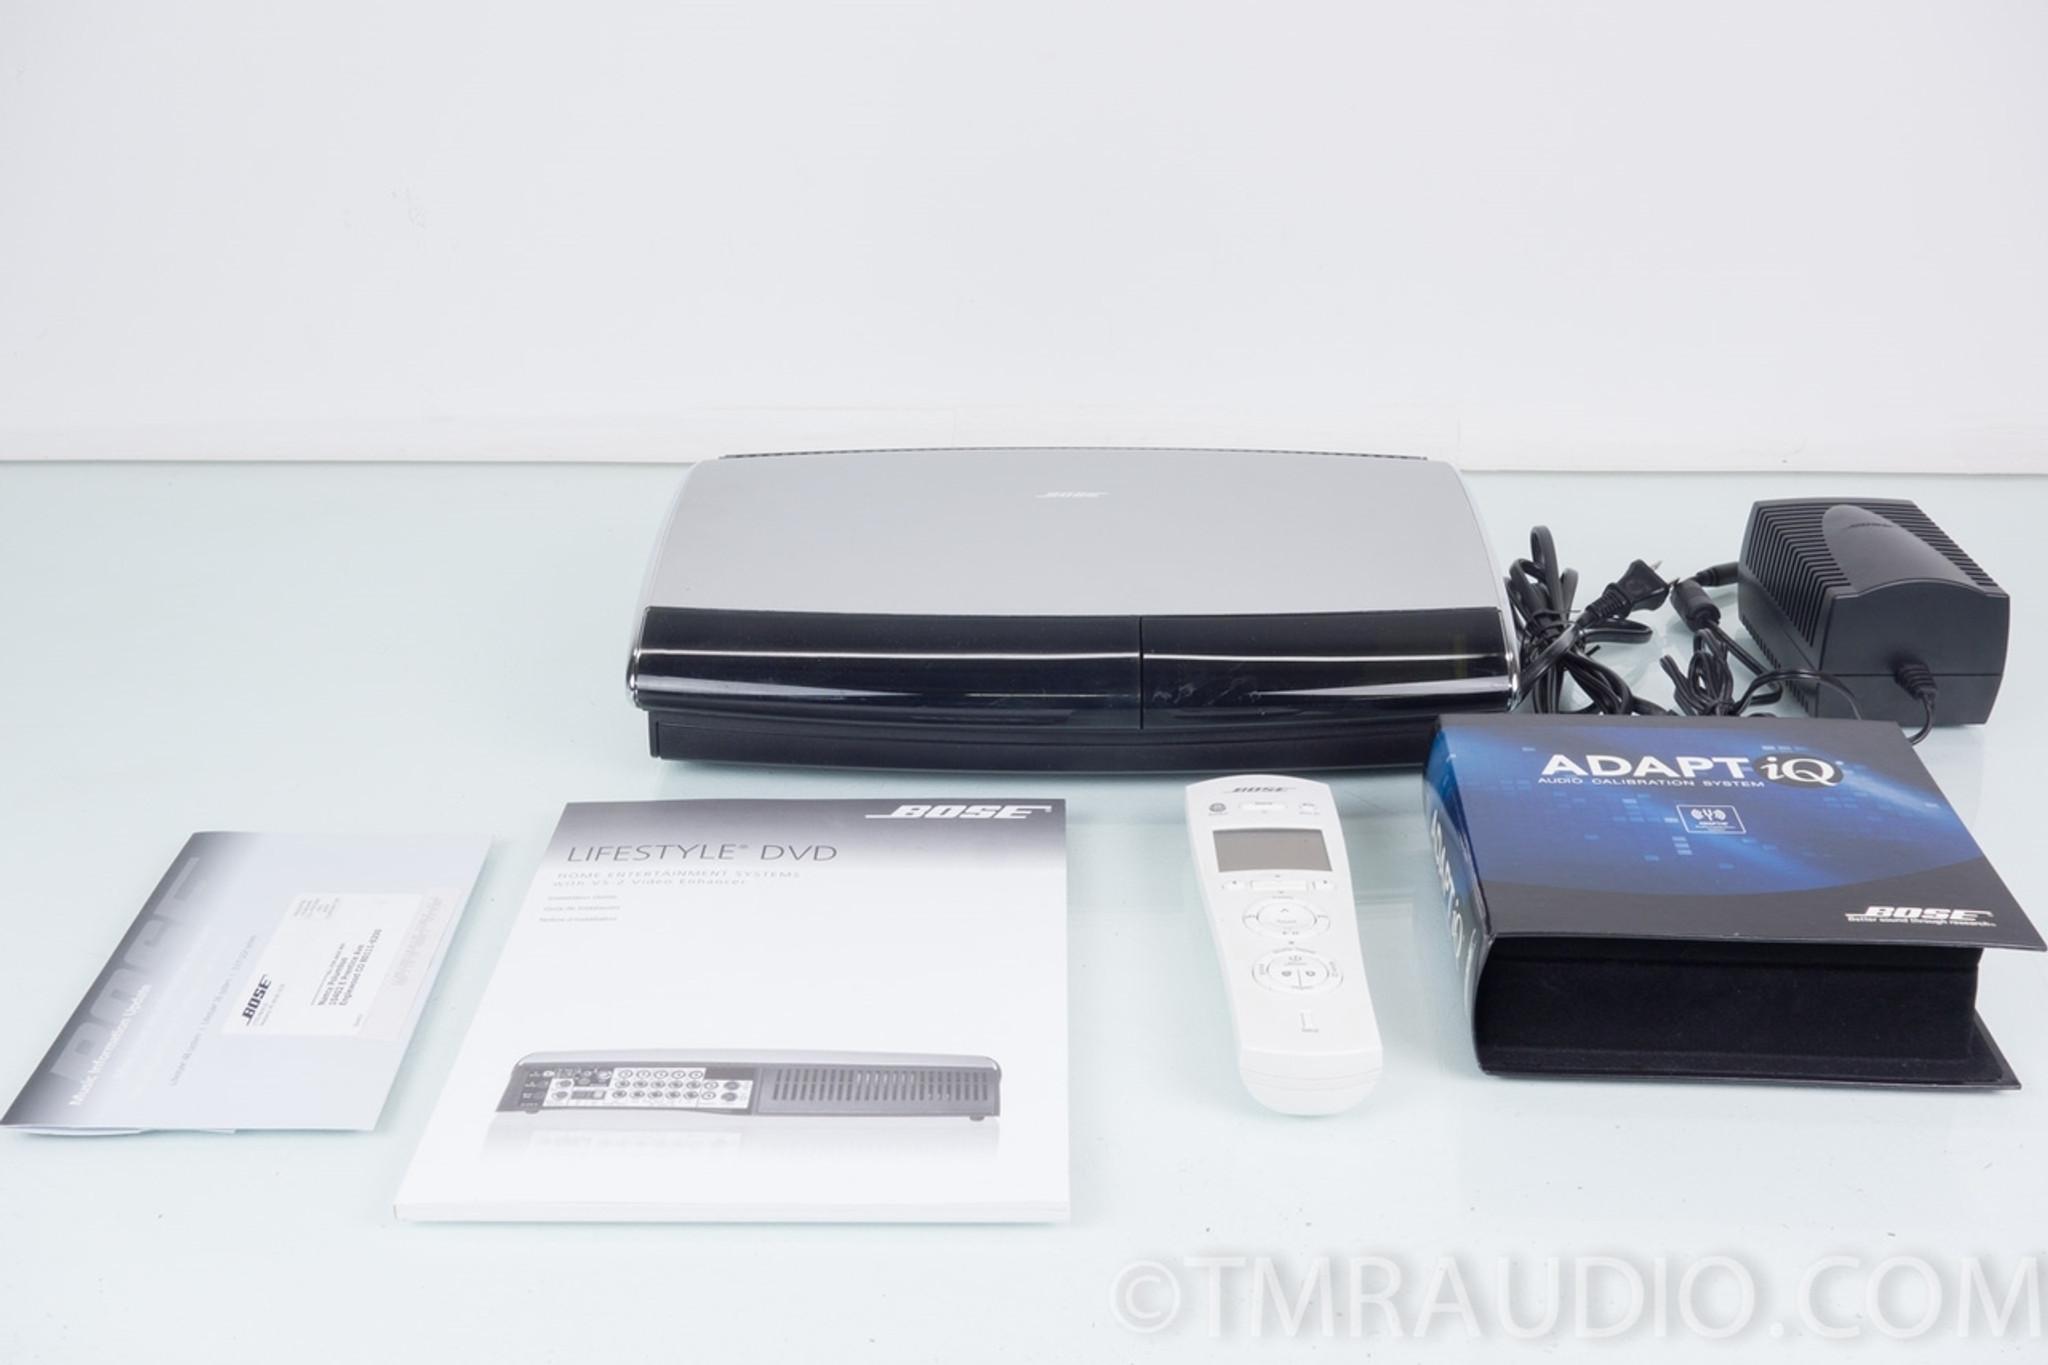 bose av48 media center dvd player remote the music room rh tmraudio com Bose Surround Sound System Bose Surround Sound System